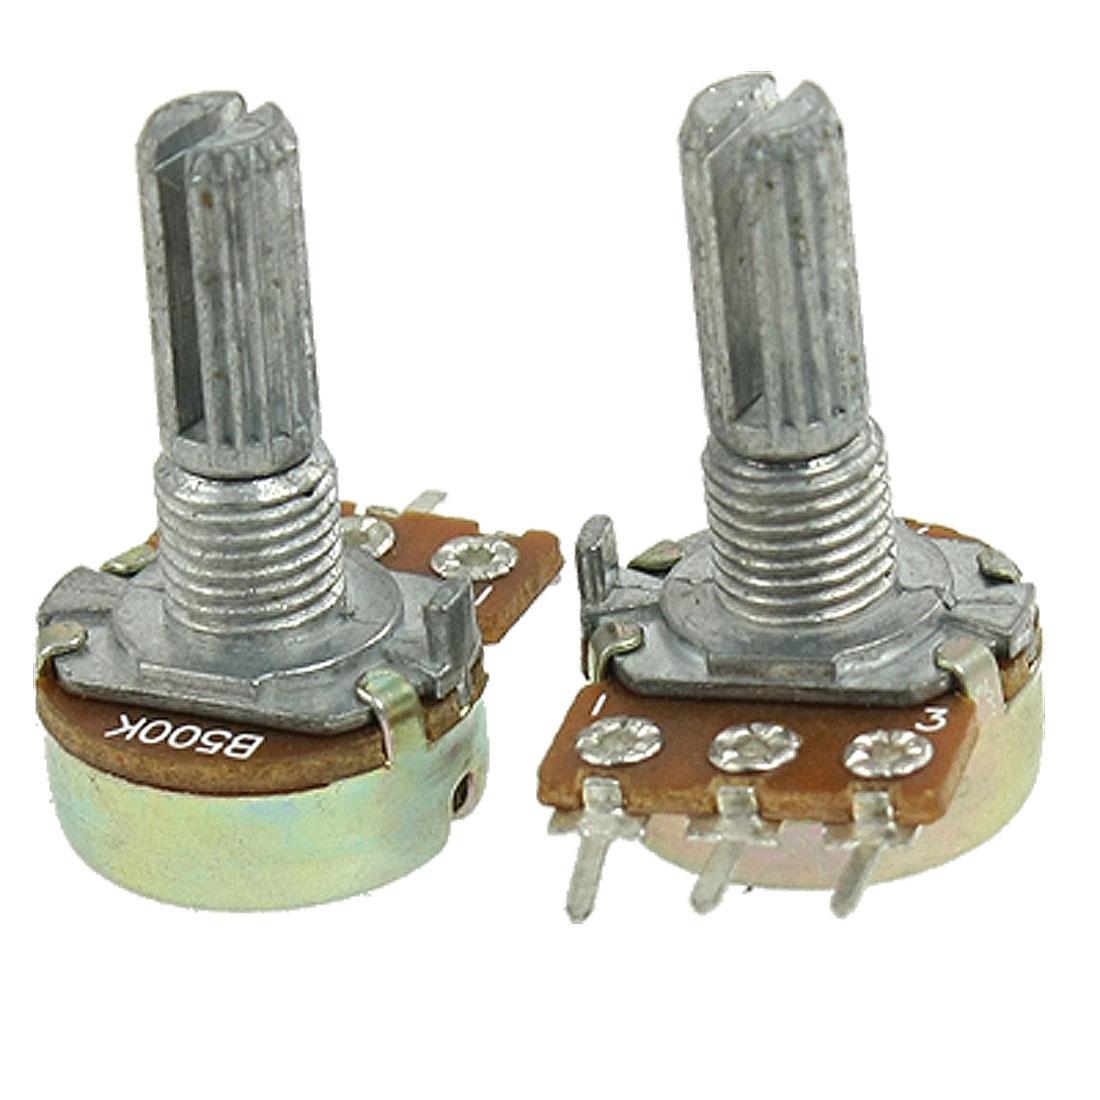 5 Pcs 500K ohm B500K Top Adjustment Single Linear Potentiometers